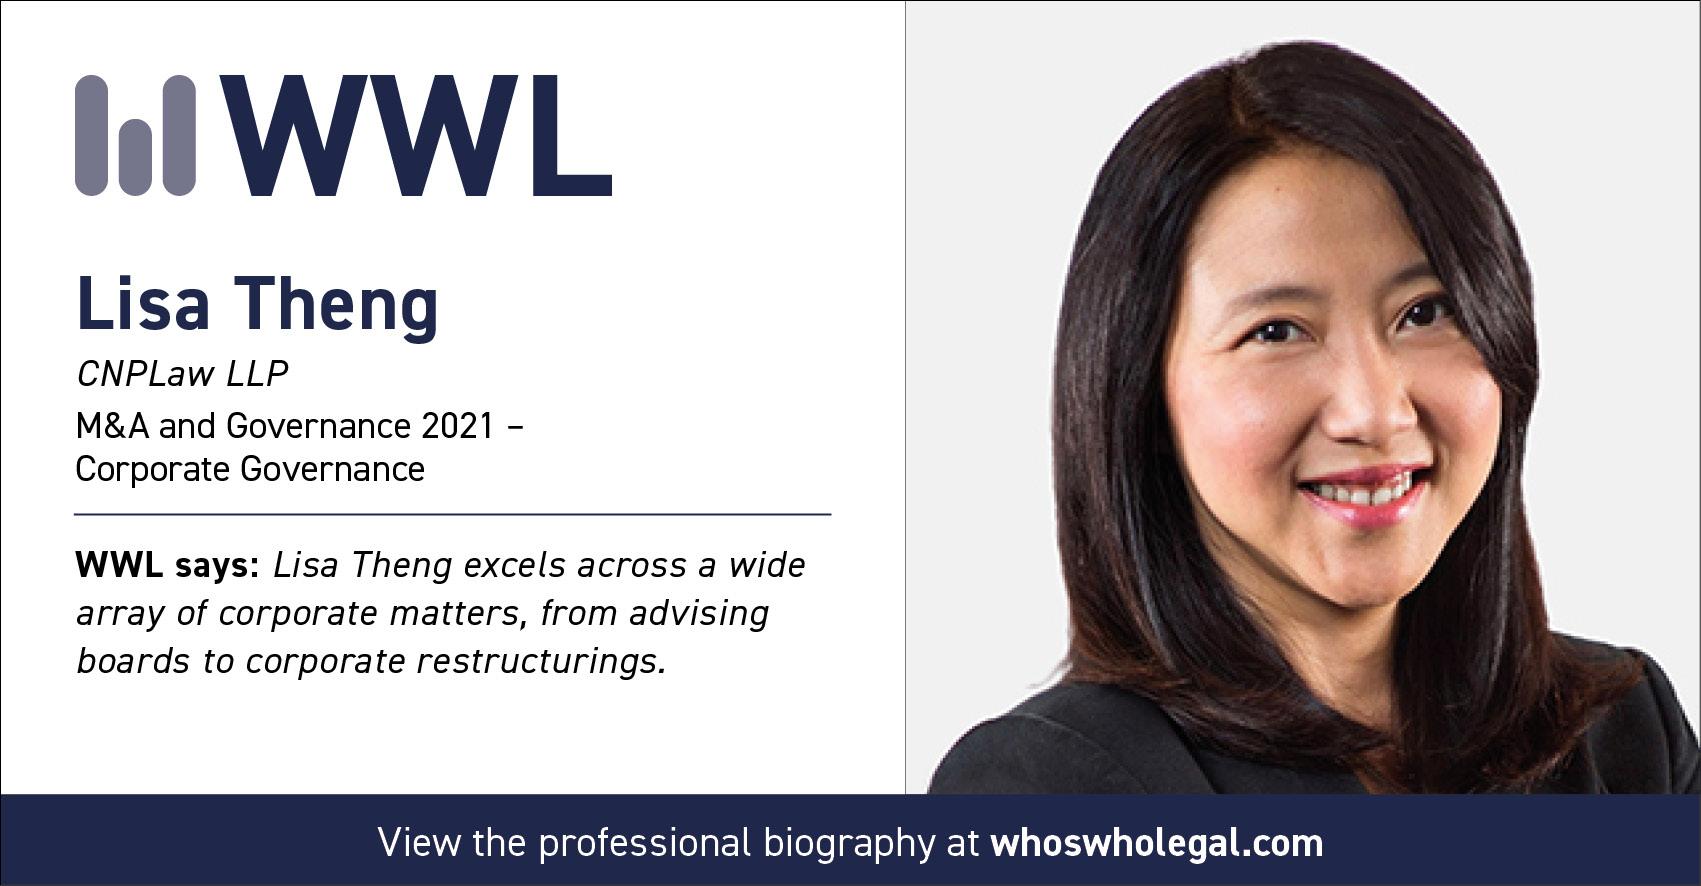 L_Theng_WWL_M&AGov_2021_CorpGov